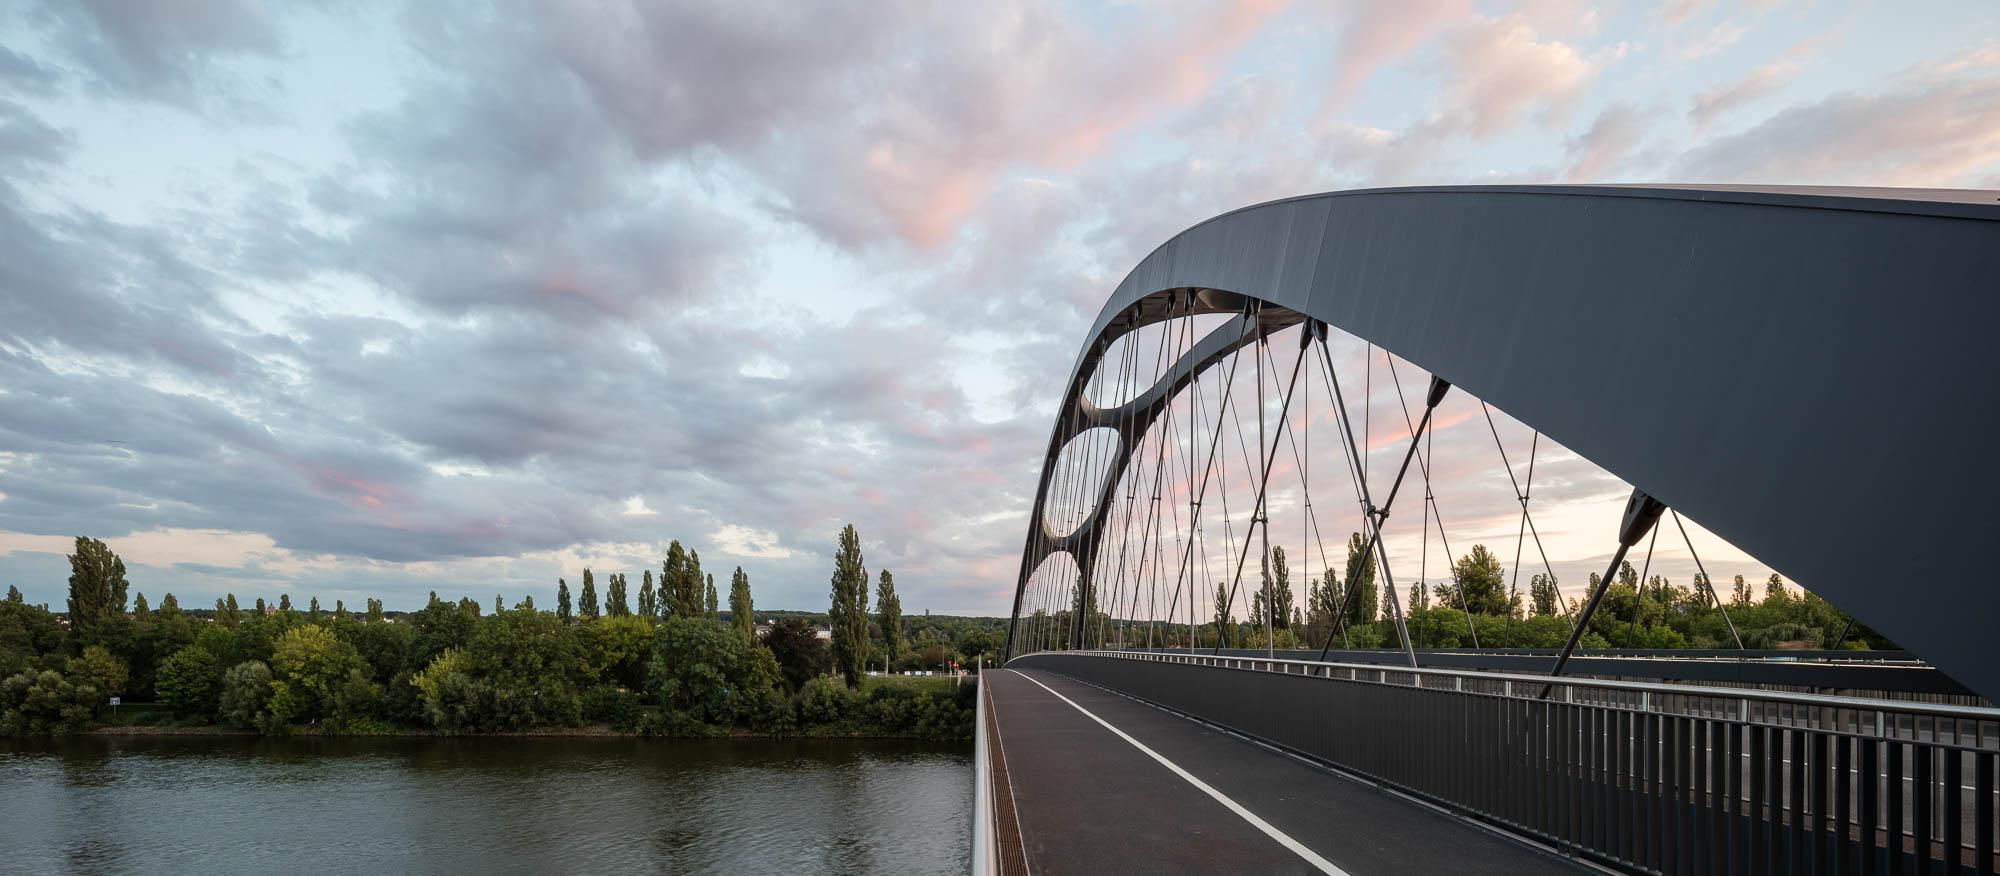 Mainbrücke Ost - Rampenbauwerk Mansellbrücke Frankfurt, 2010-2013, Ferdinand Heide Architekt BDA Frankfurt am Main